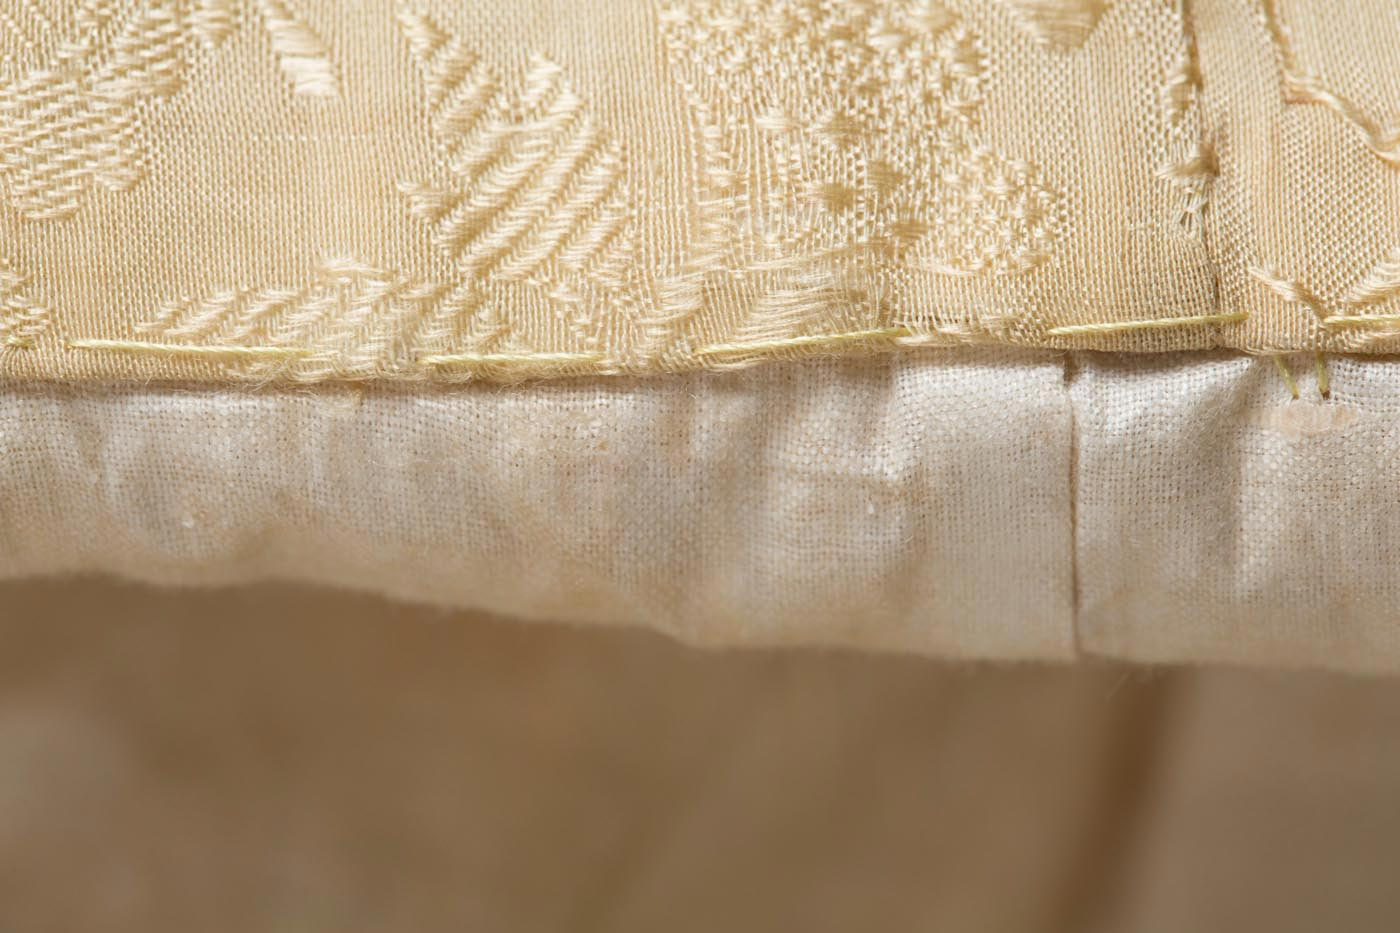 Hem detail. - click to view larger image